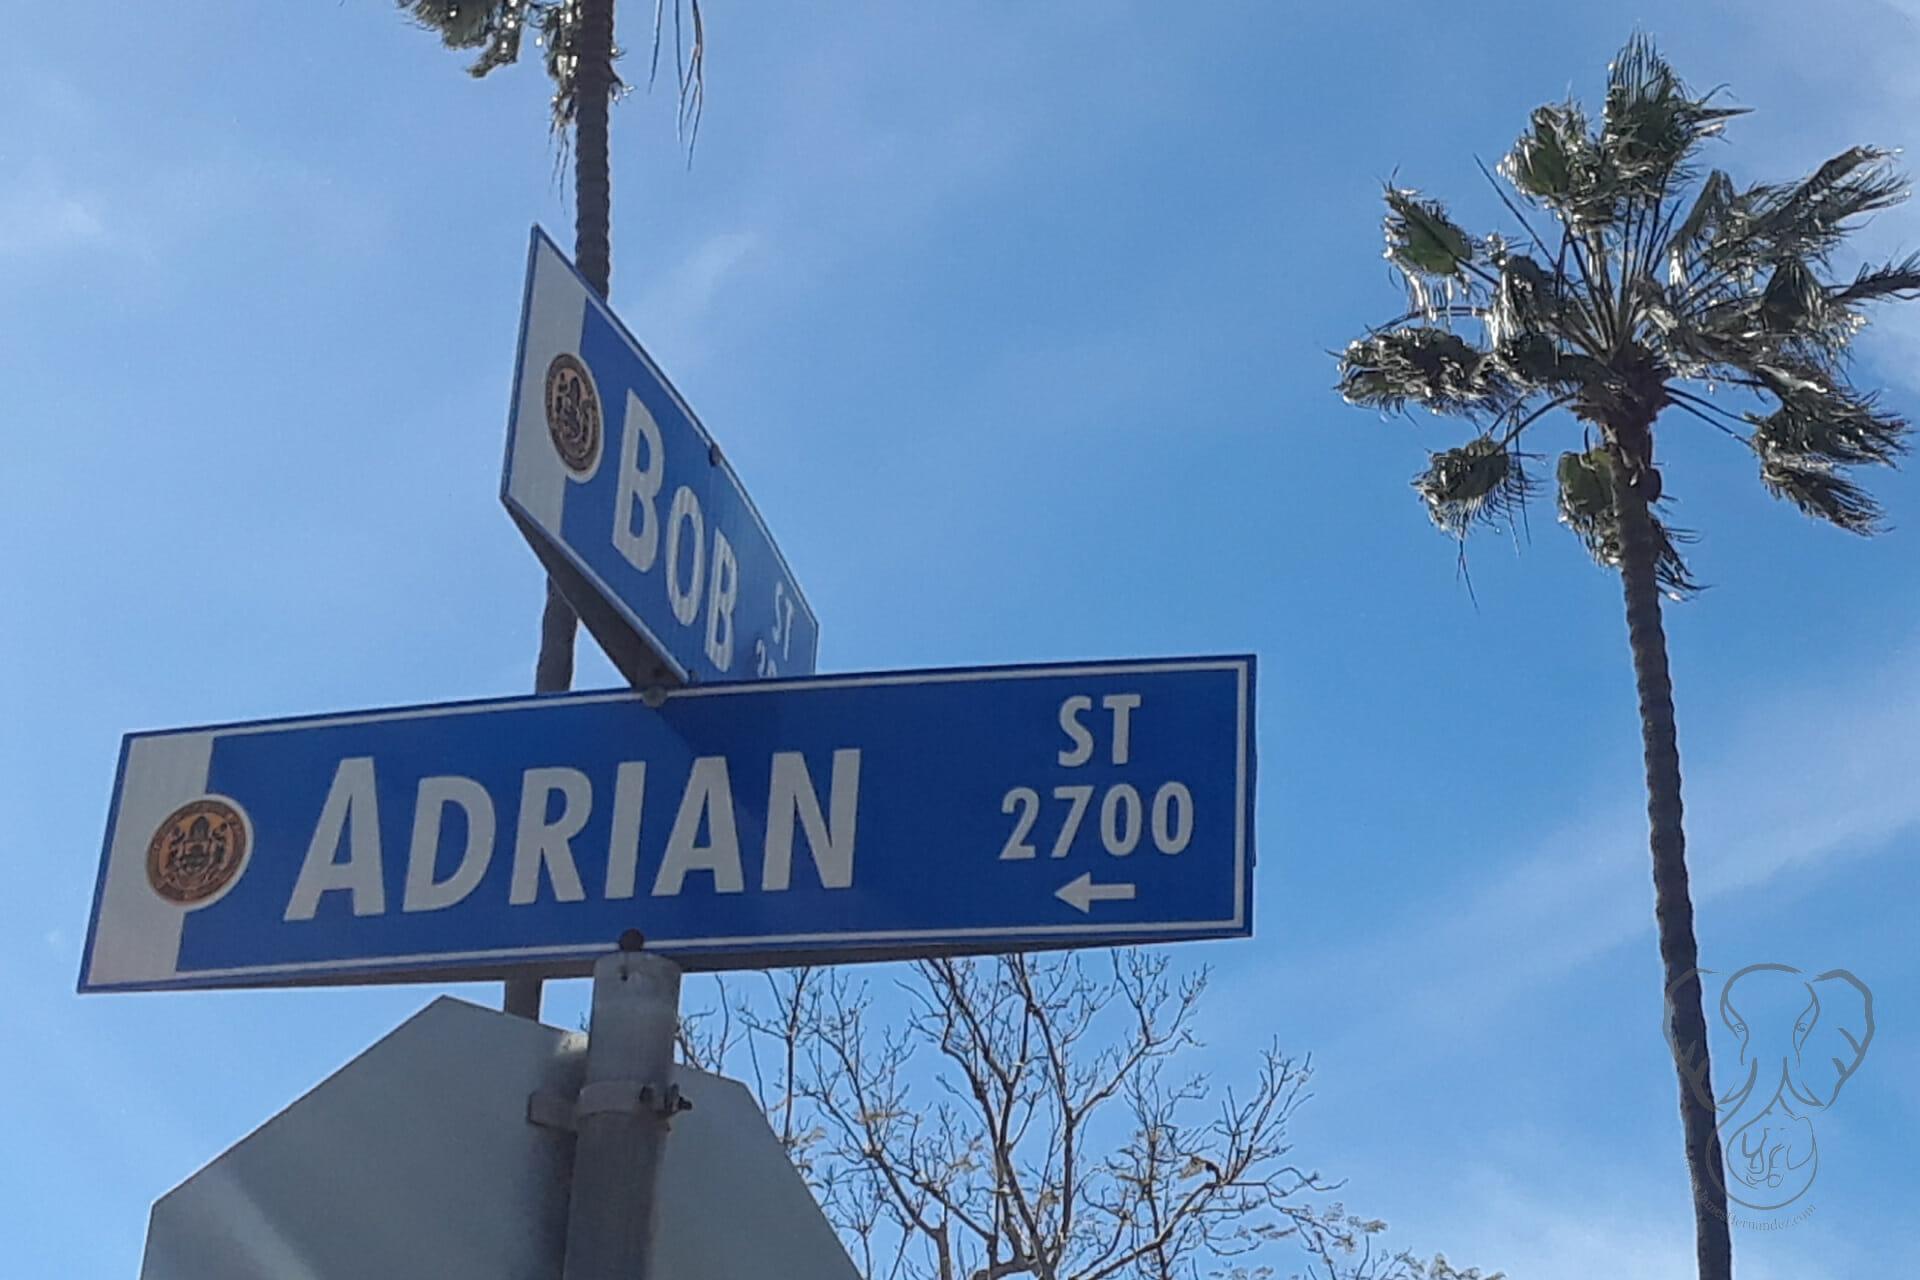 Adrian Street sign in San Diego, California (Miranda Hernandez)